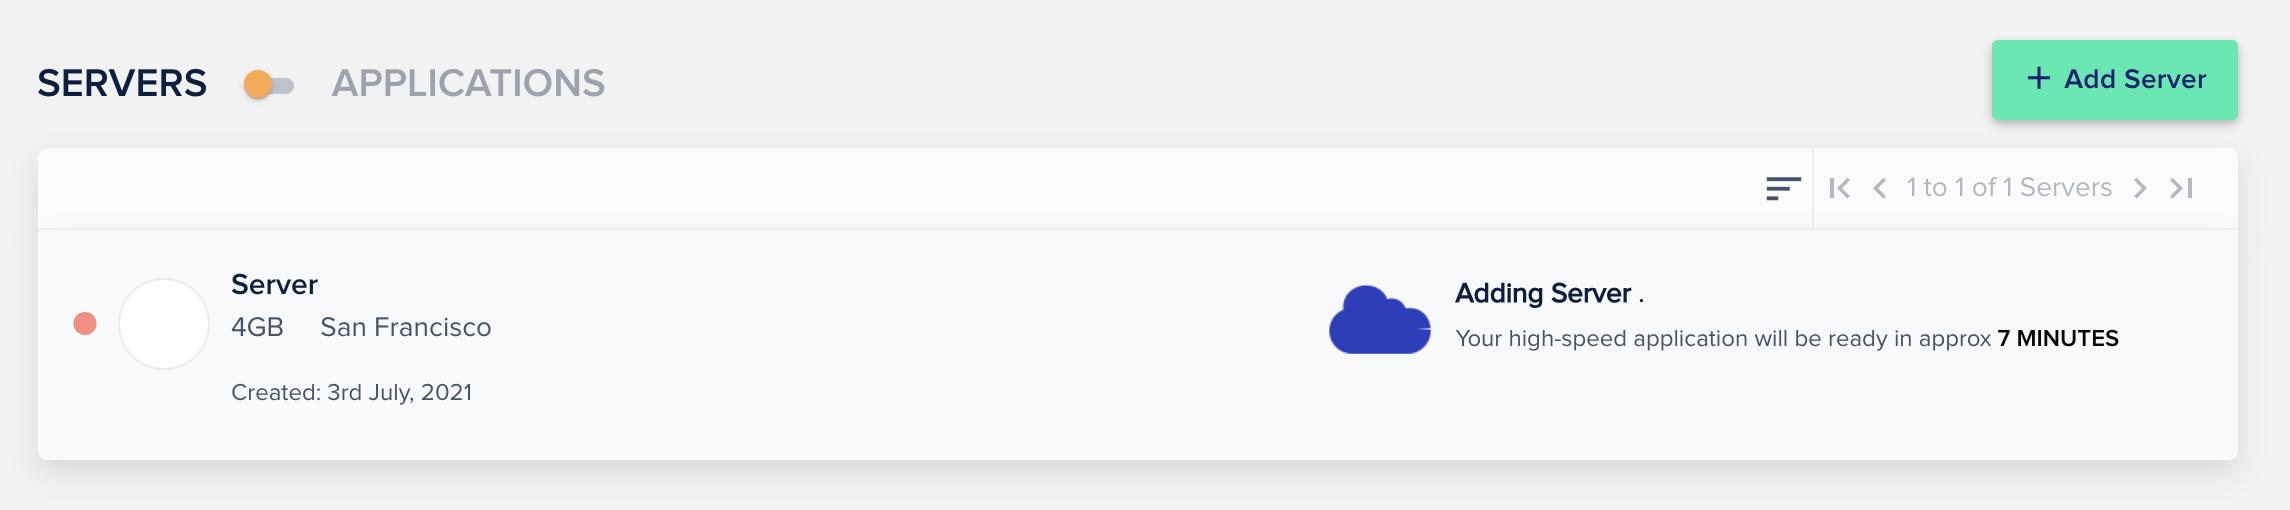 adding-server.png